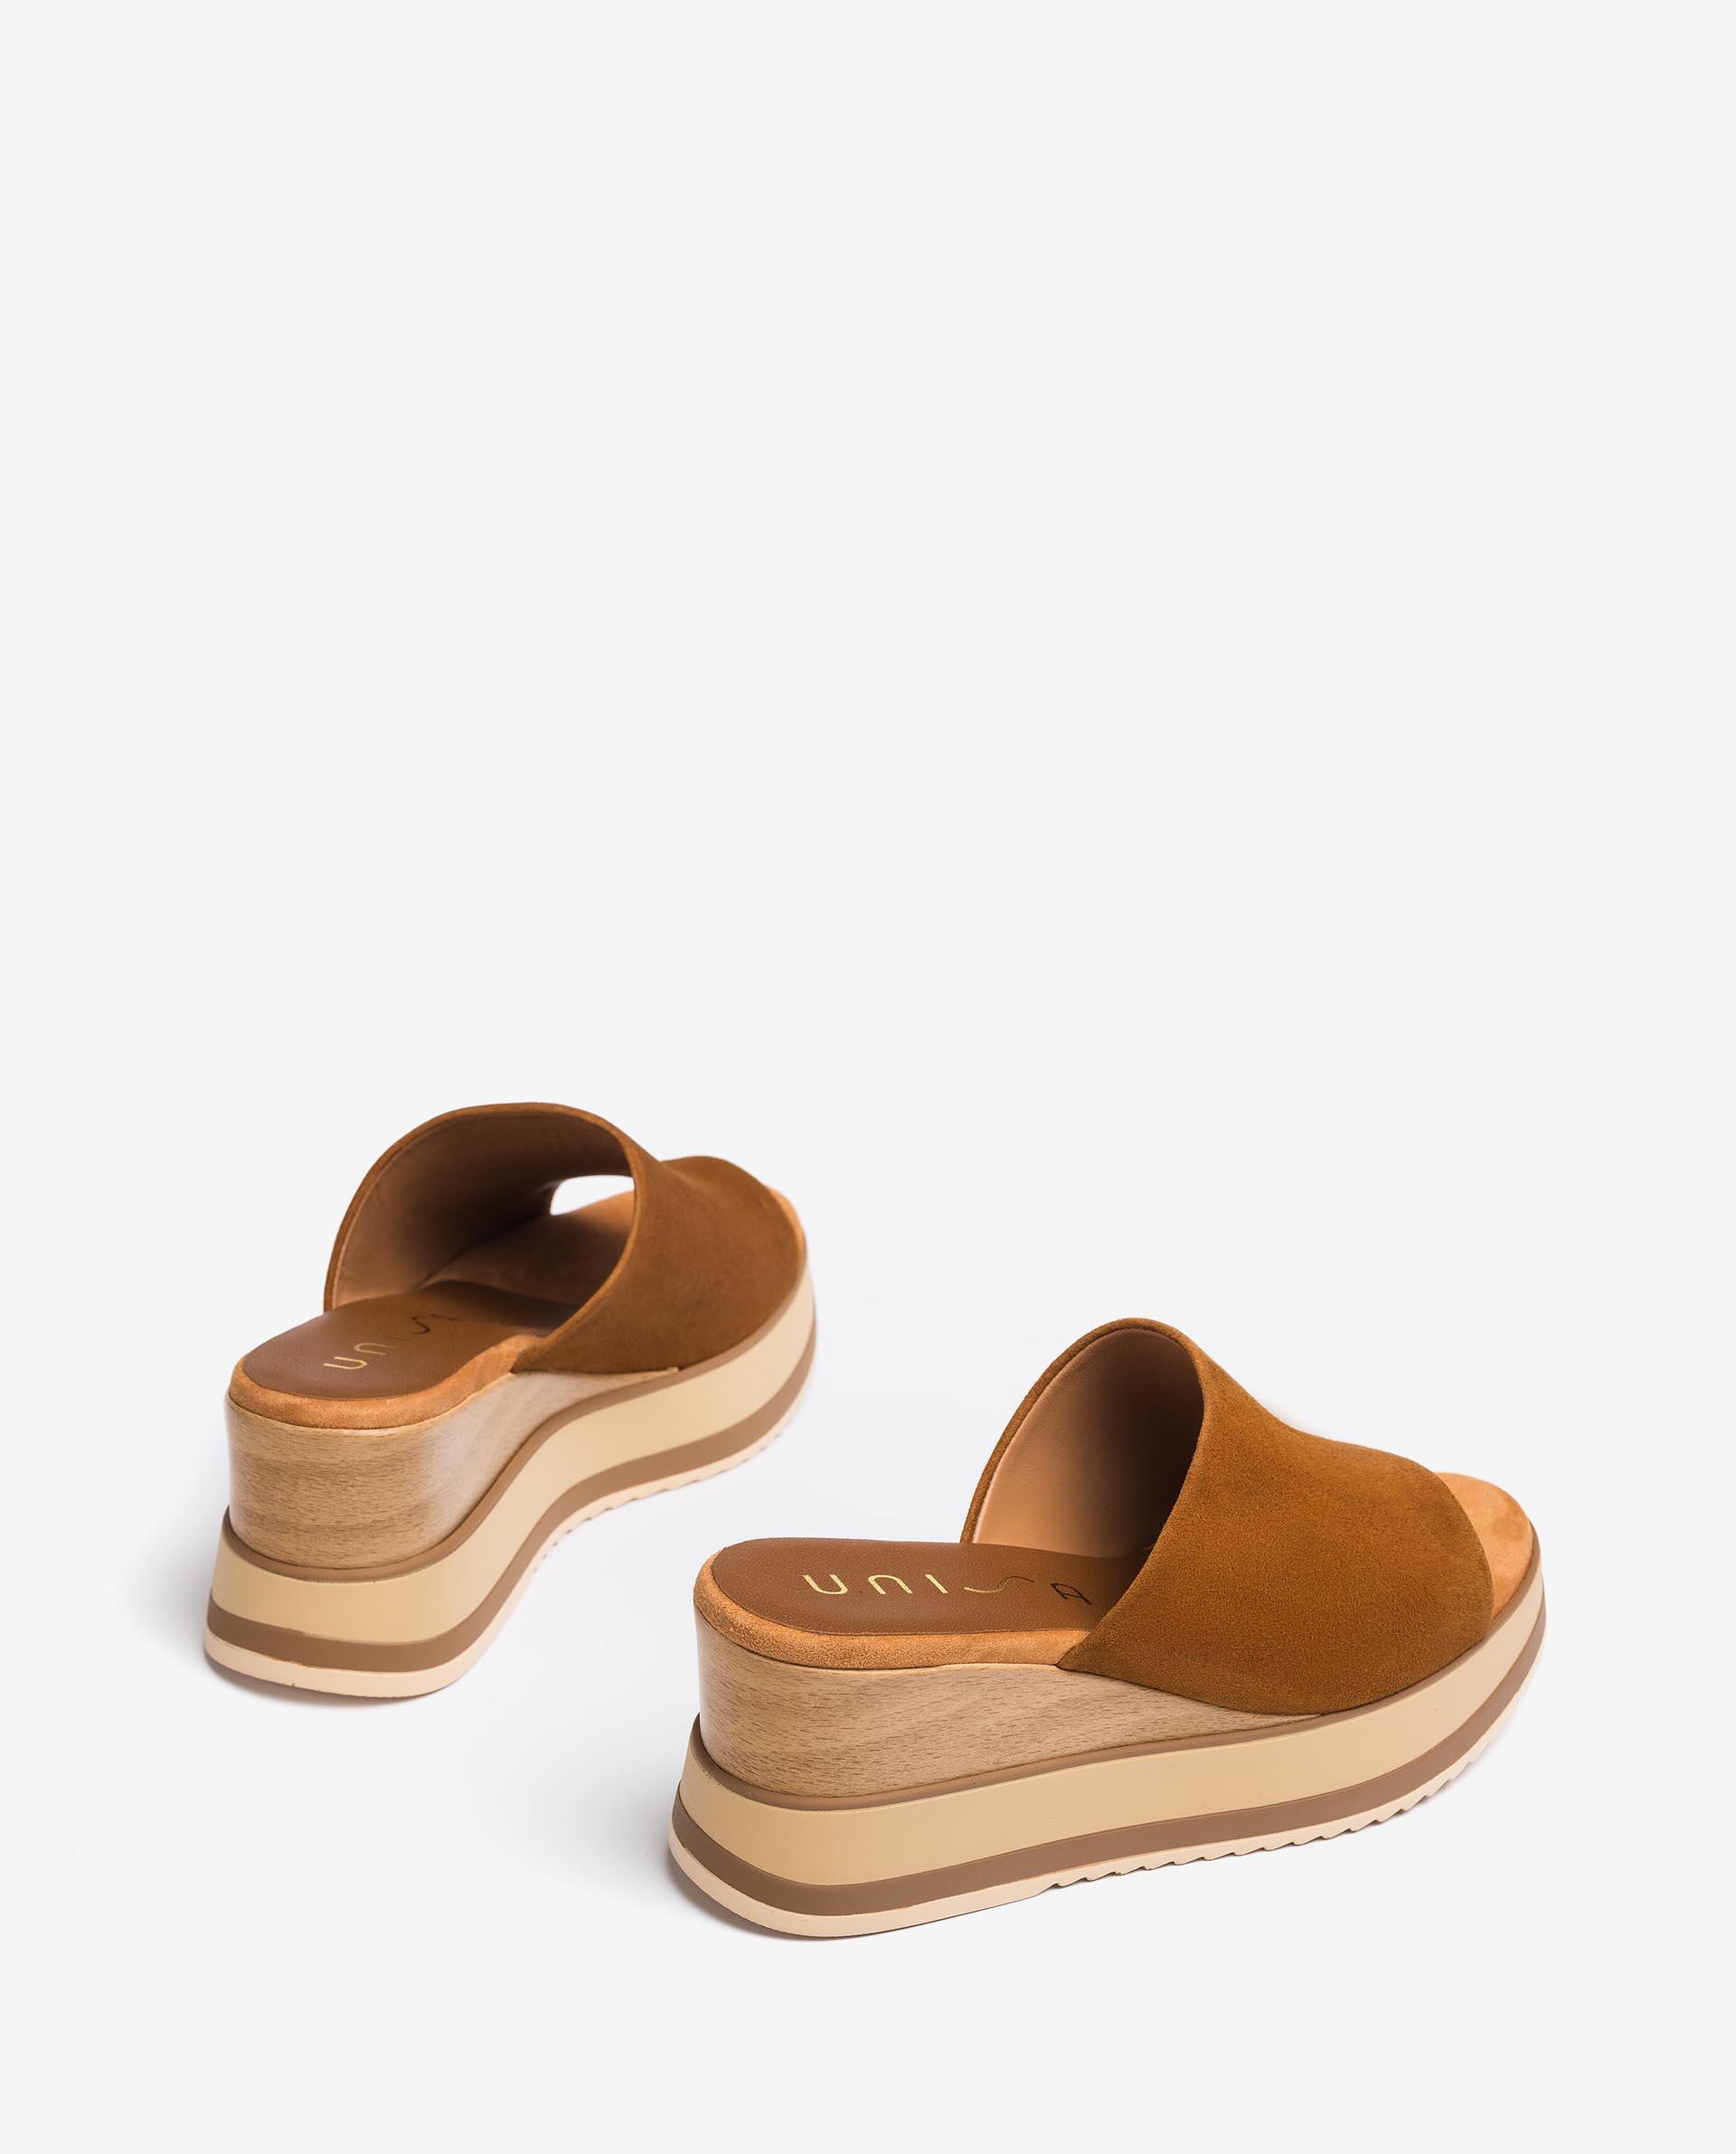 UNISA Sandalen mit Keilsohle und breitem Oberleder KALANI_KS 5